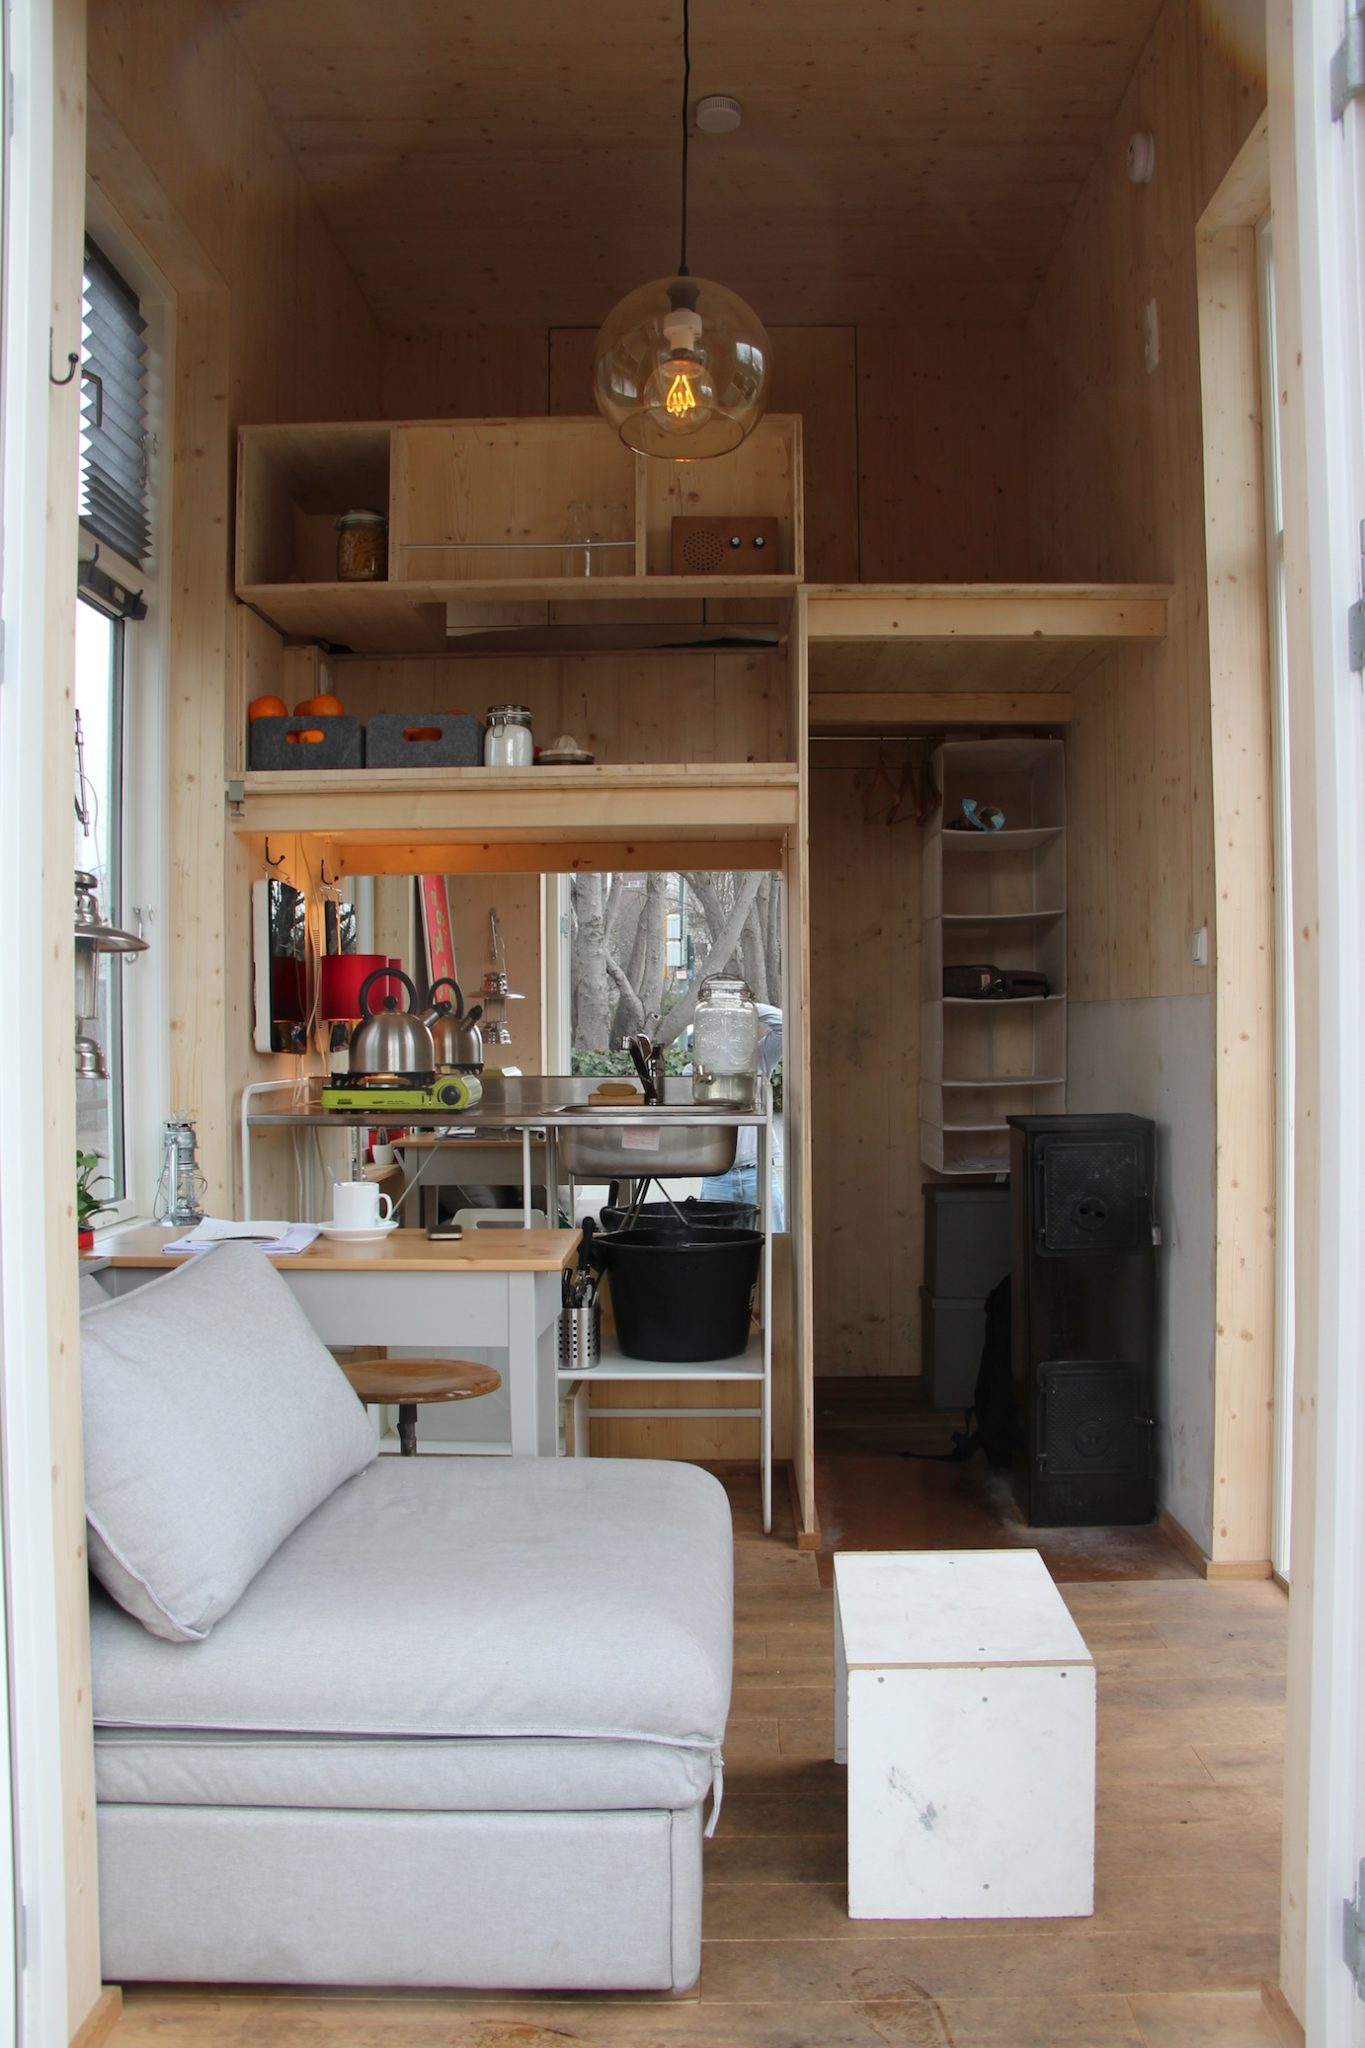 van bo le mentzel tiny house frontal. Black Bedroom Furniture Sets. Home Design Ideas